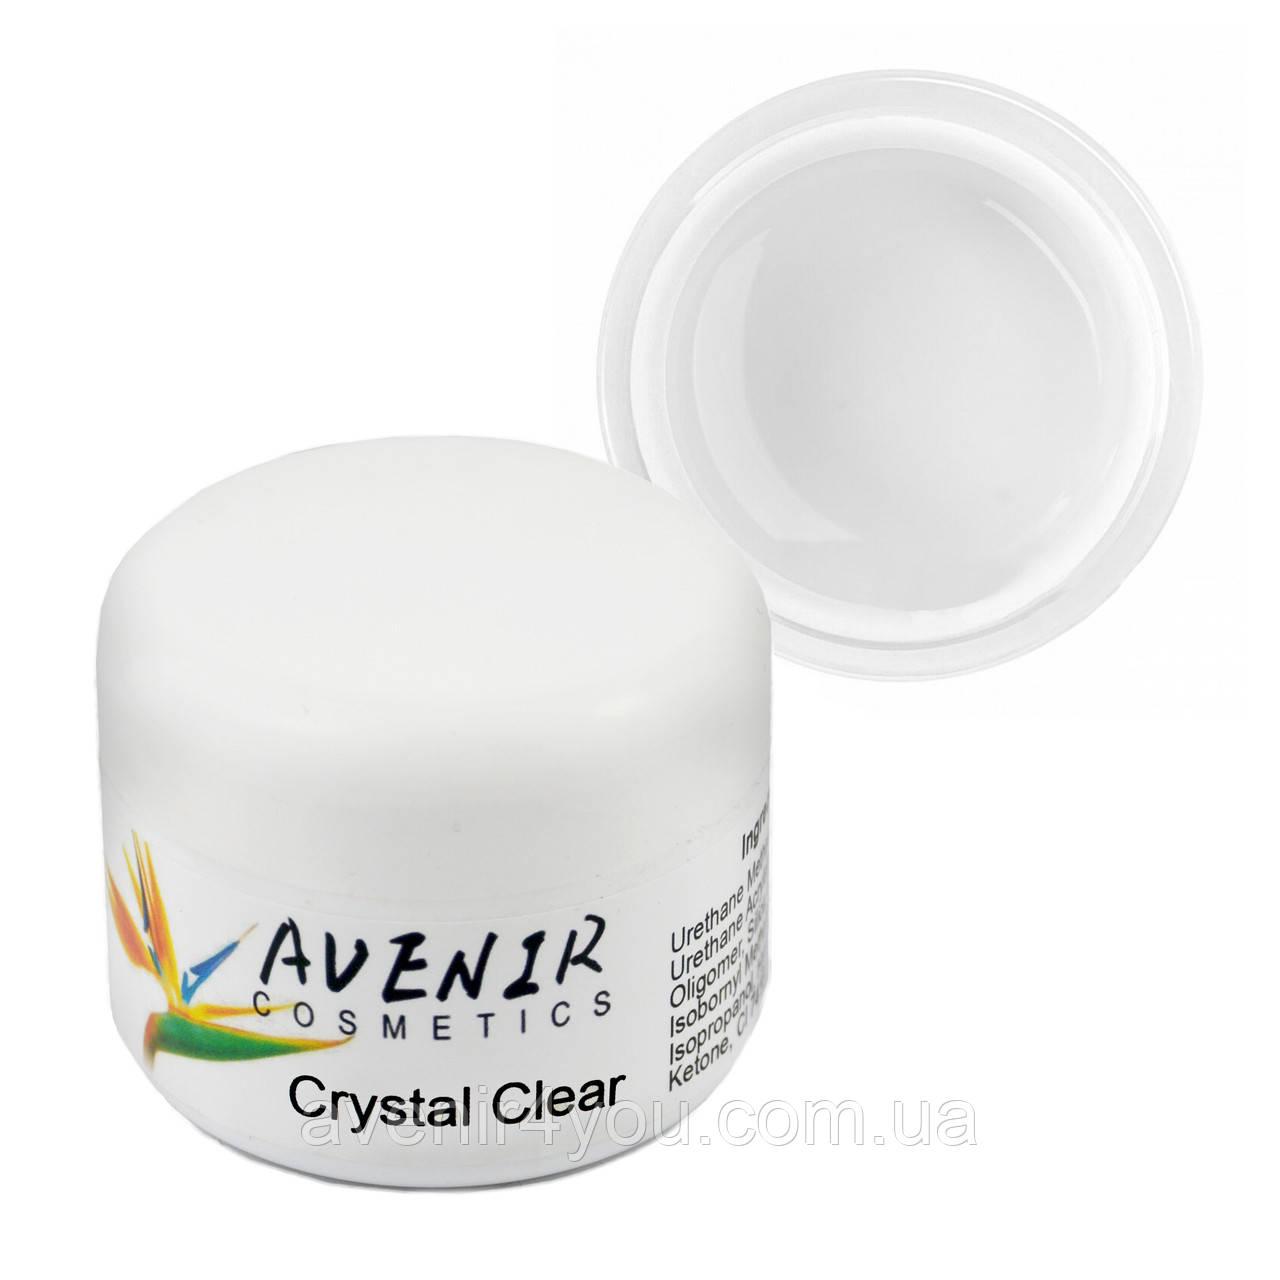 Гель для нарощування Crystal clear Avenir 15 мл, 30 мл, 50 мл